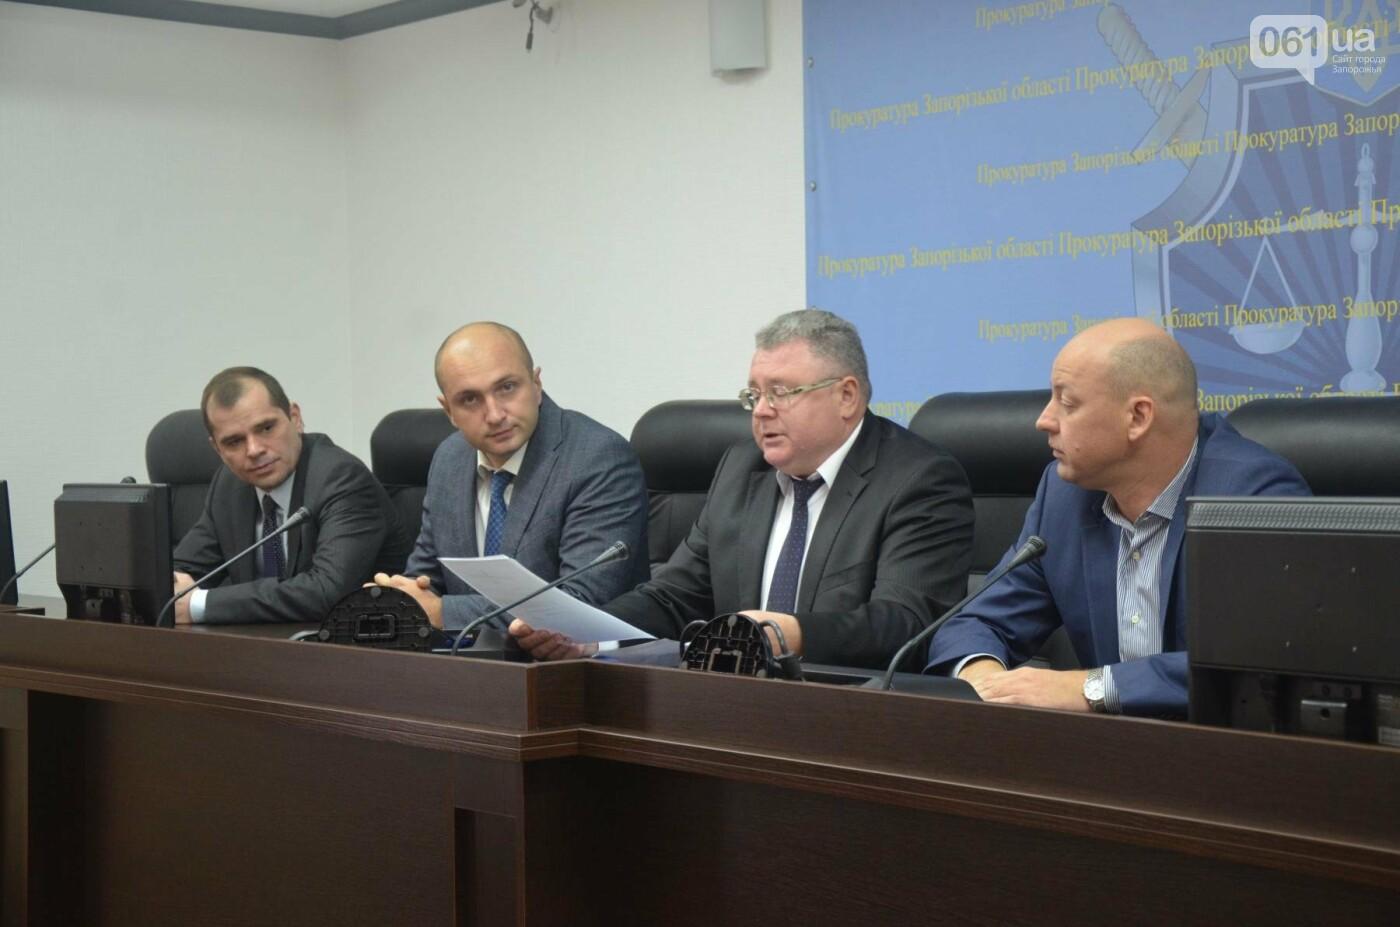 Местную прокуратуру №3 в Запорожье возглавил экс-прокурор Кривого Рога, - ФОТО , фото-3